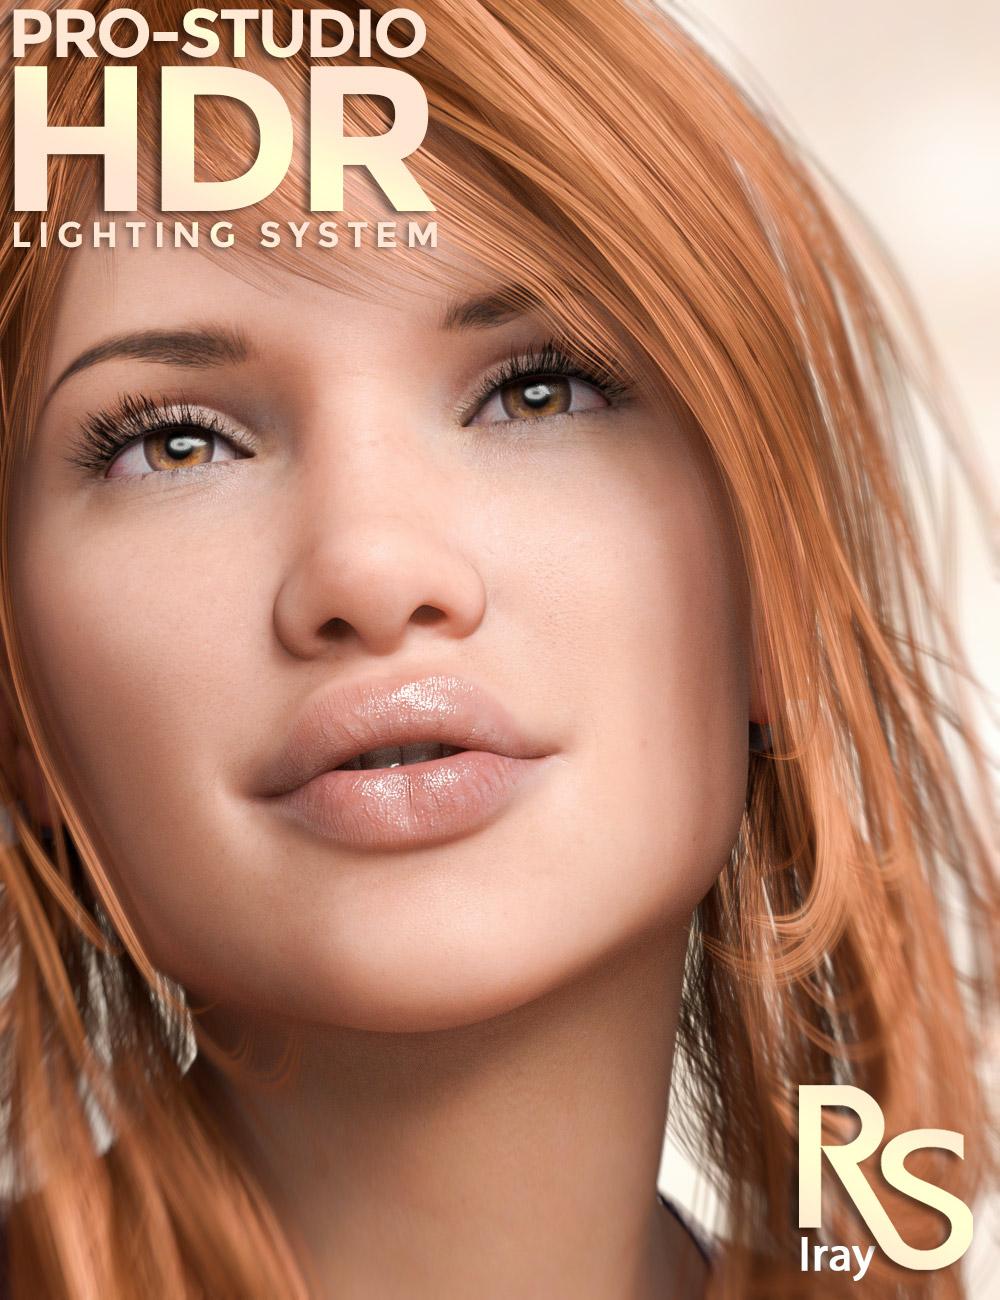 PRO-Studio HDR Lighting System by: Colm Jackson, 3D Models by Daz 3D